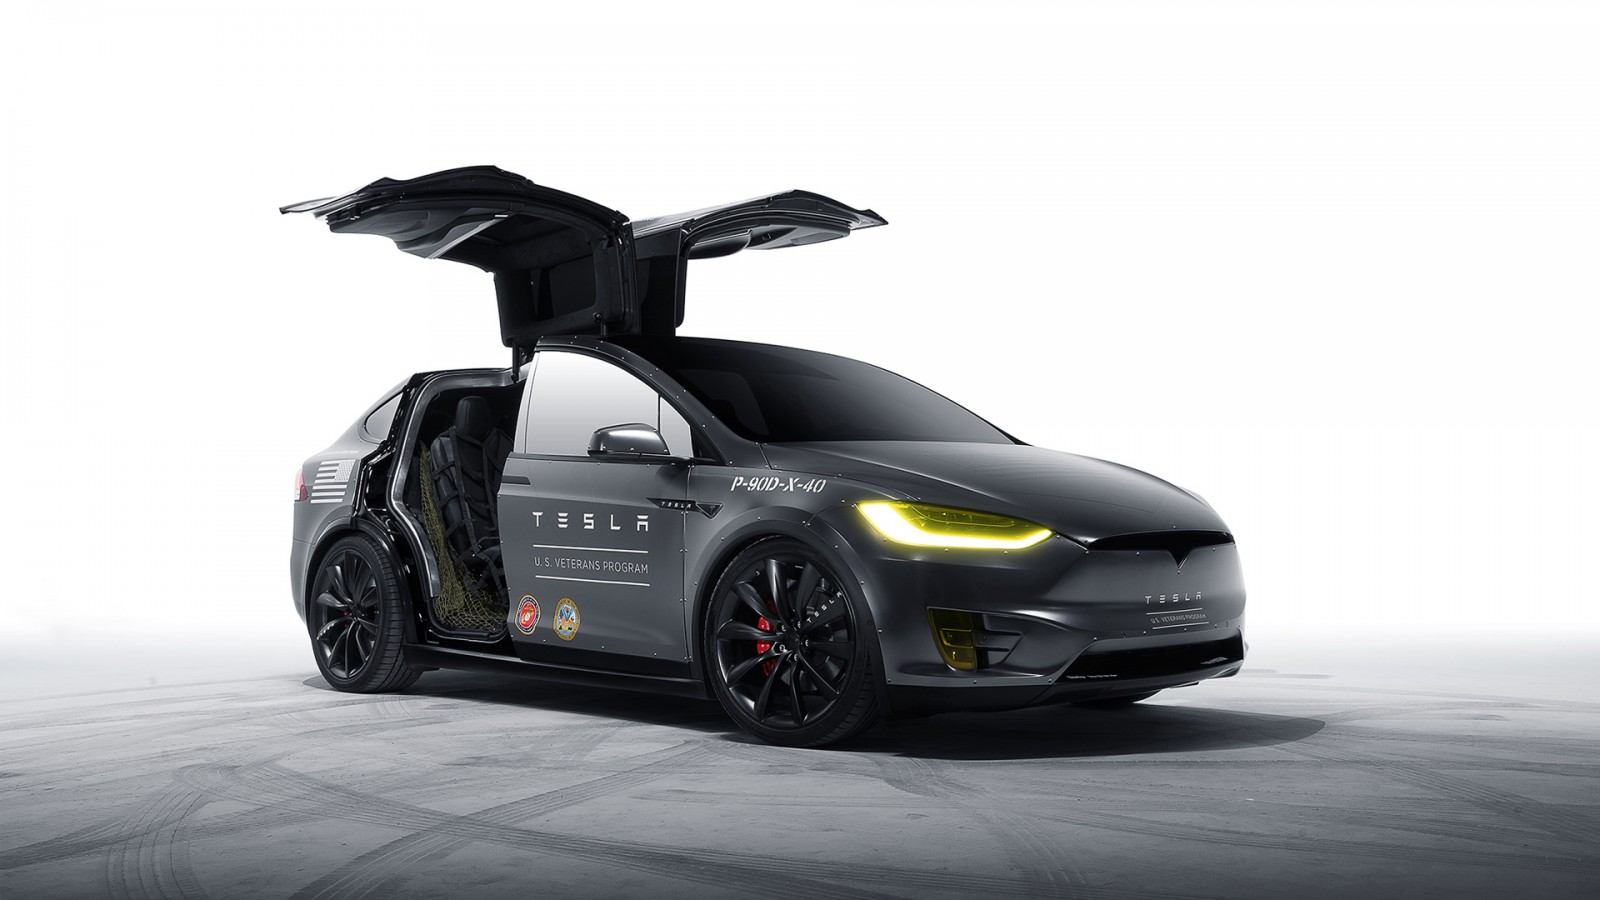 Muscle Car Iphone Wallpaper Model X Tesla Motors Wallpaper Hd Car Wallpapers Id 5976